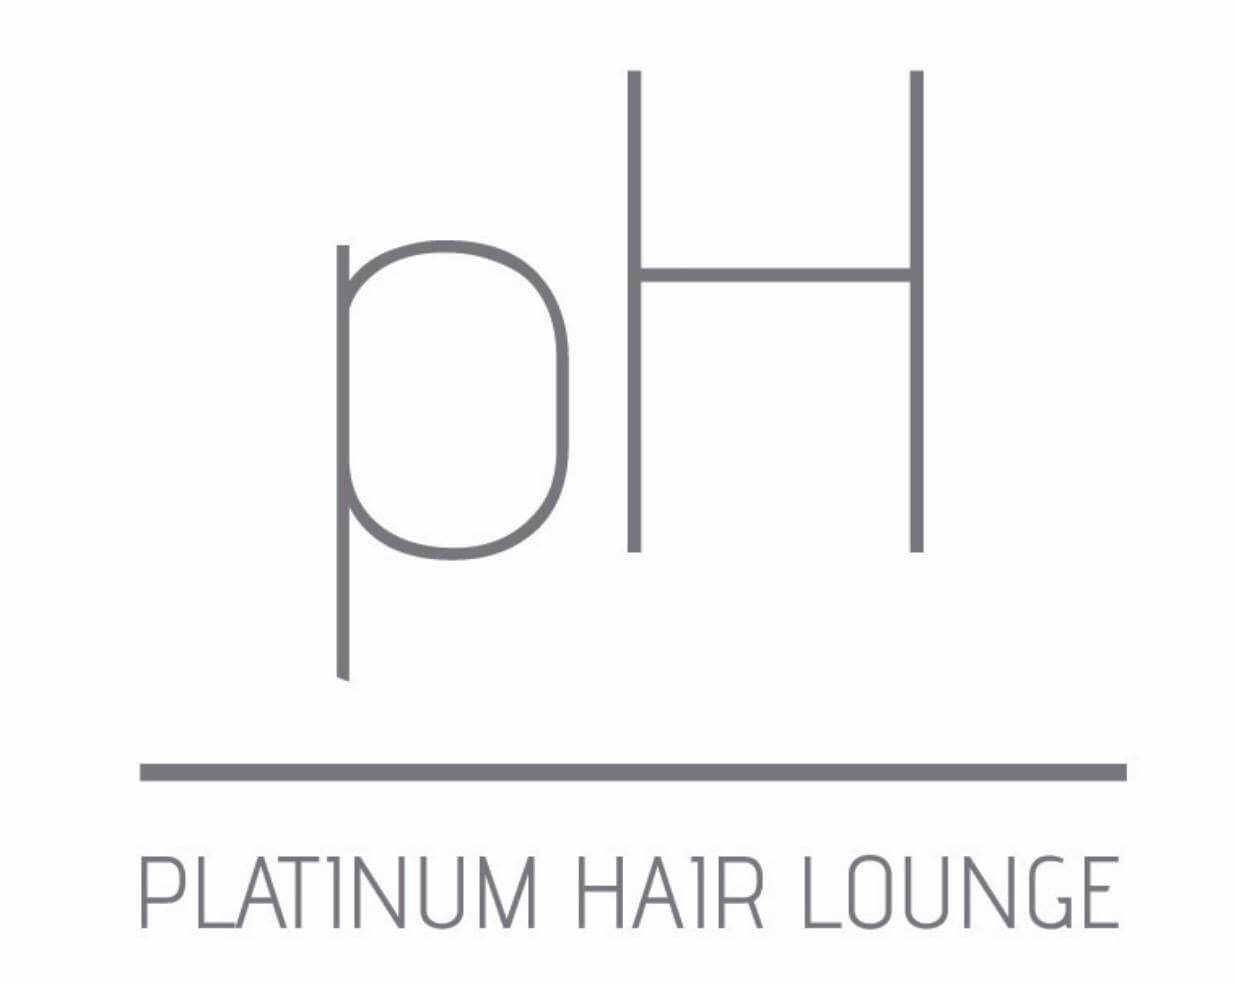 Platinum Hair Lounge